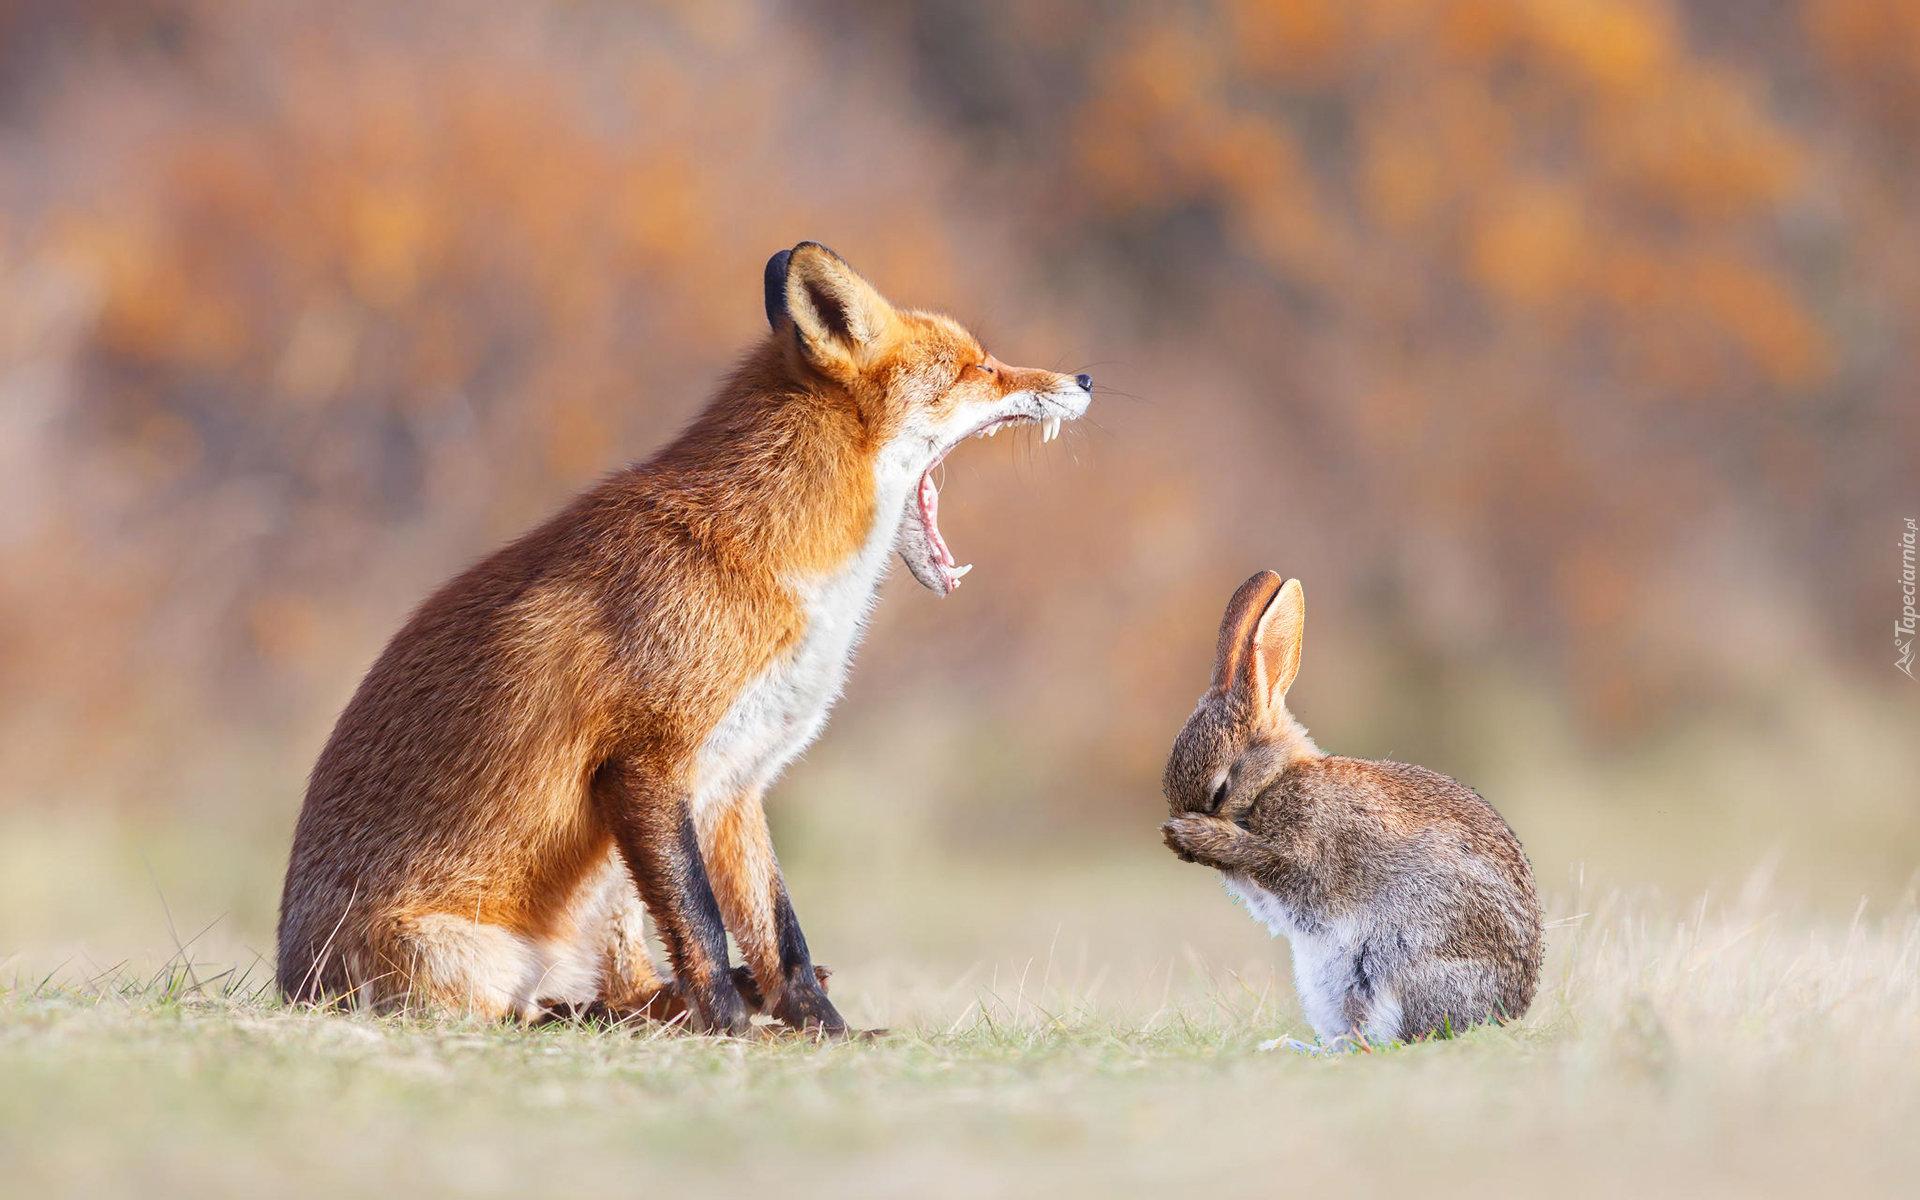 Cute Baby Rabbit Wallpapers Lis Skarcił Zajączka